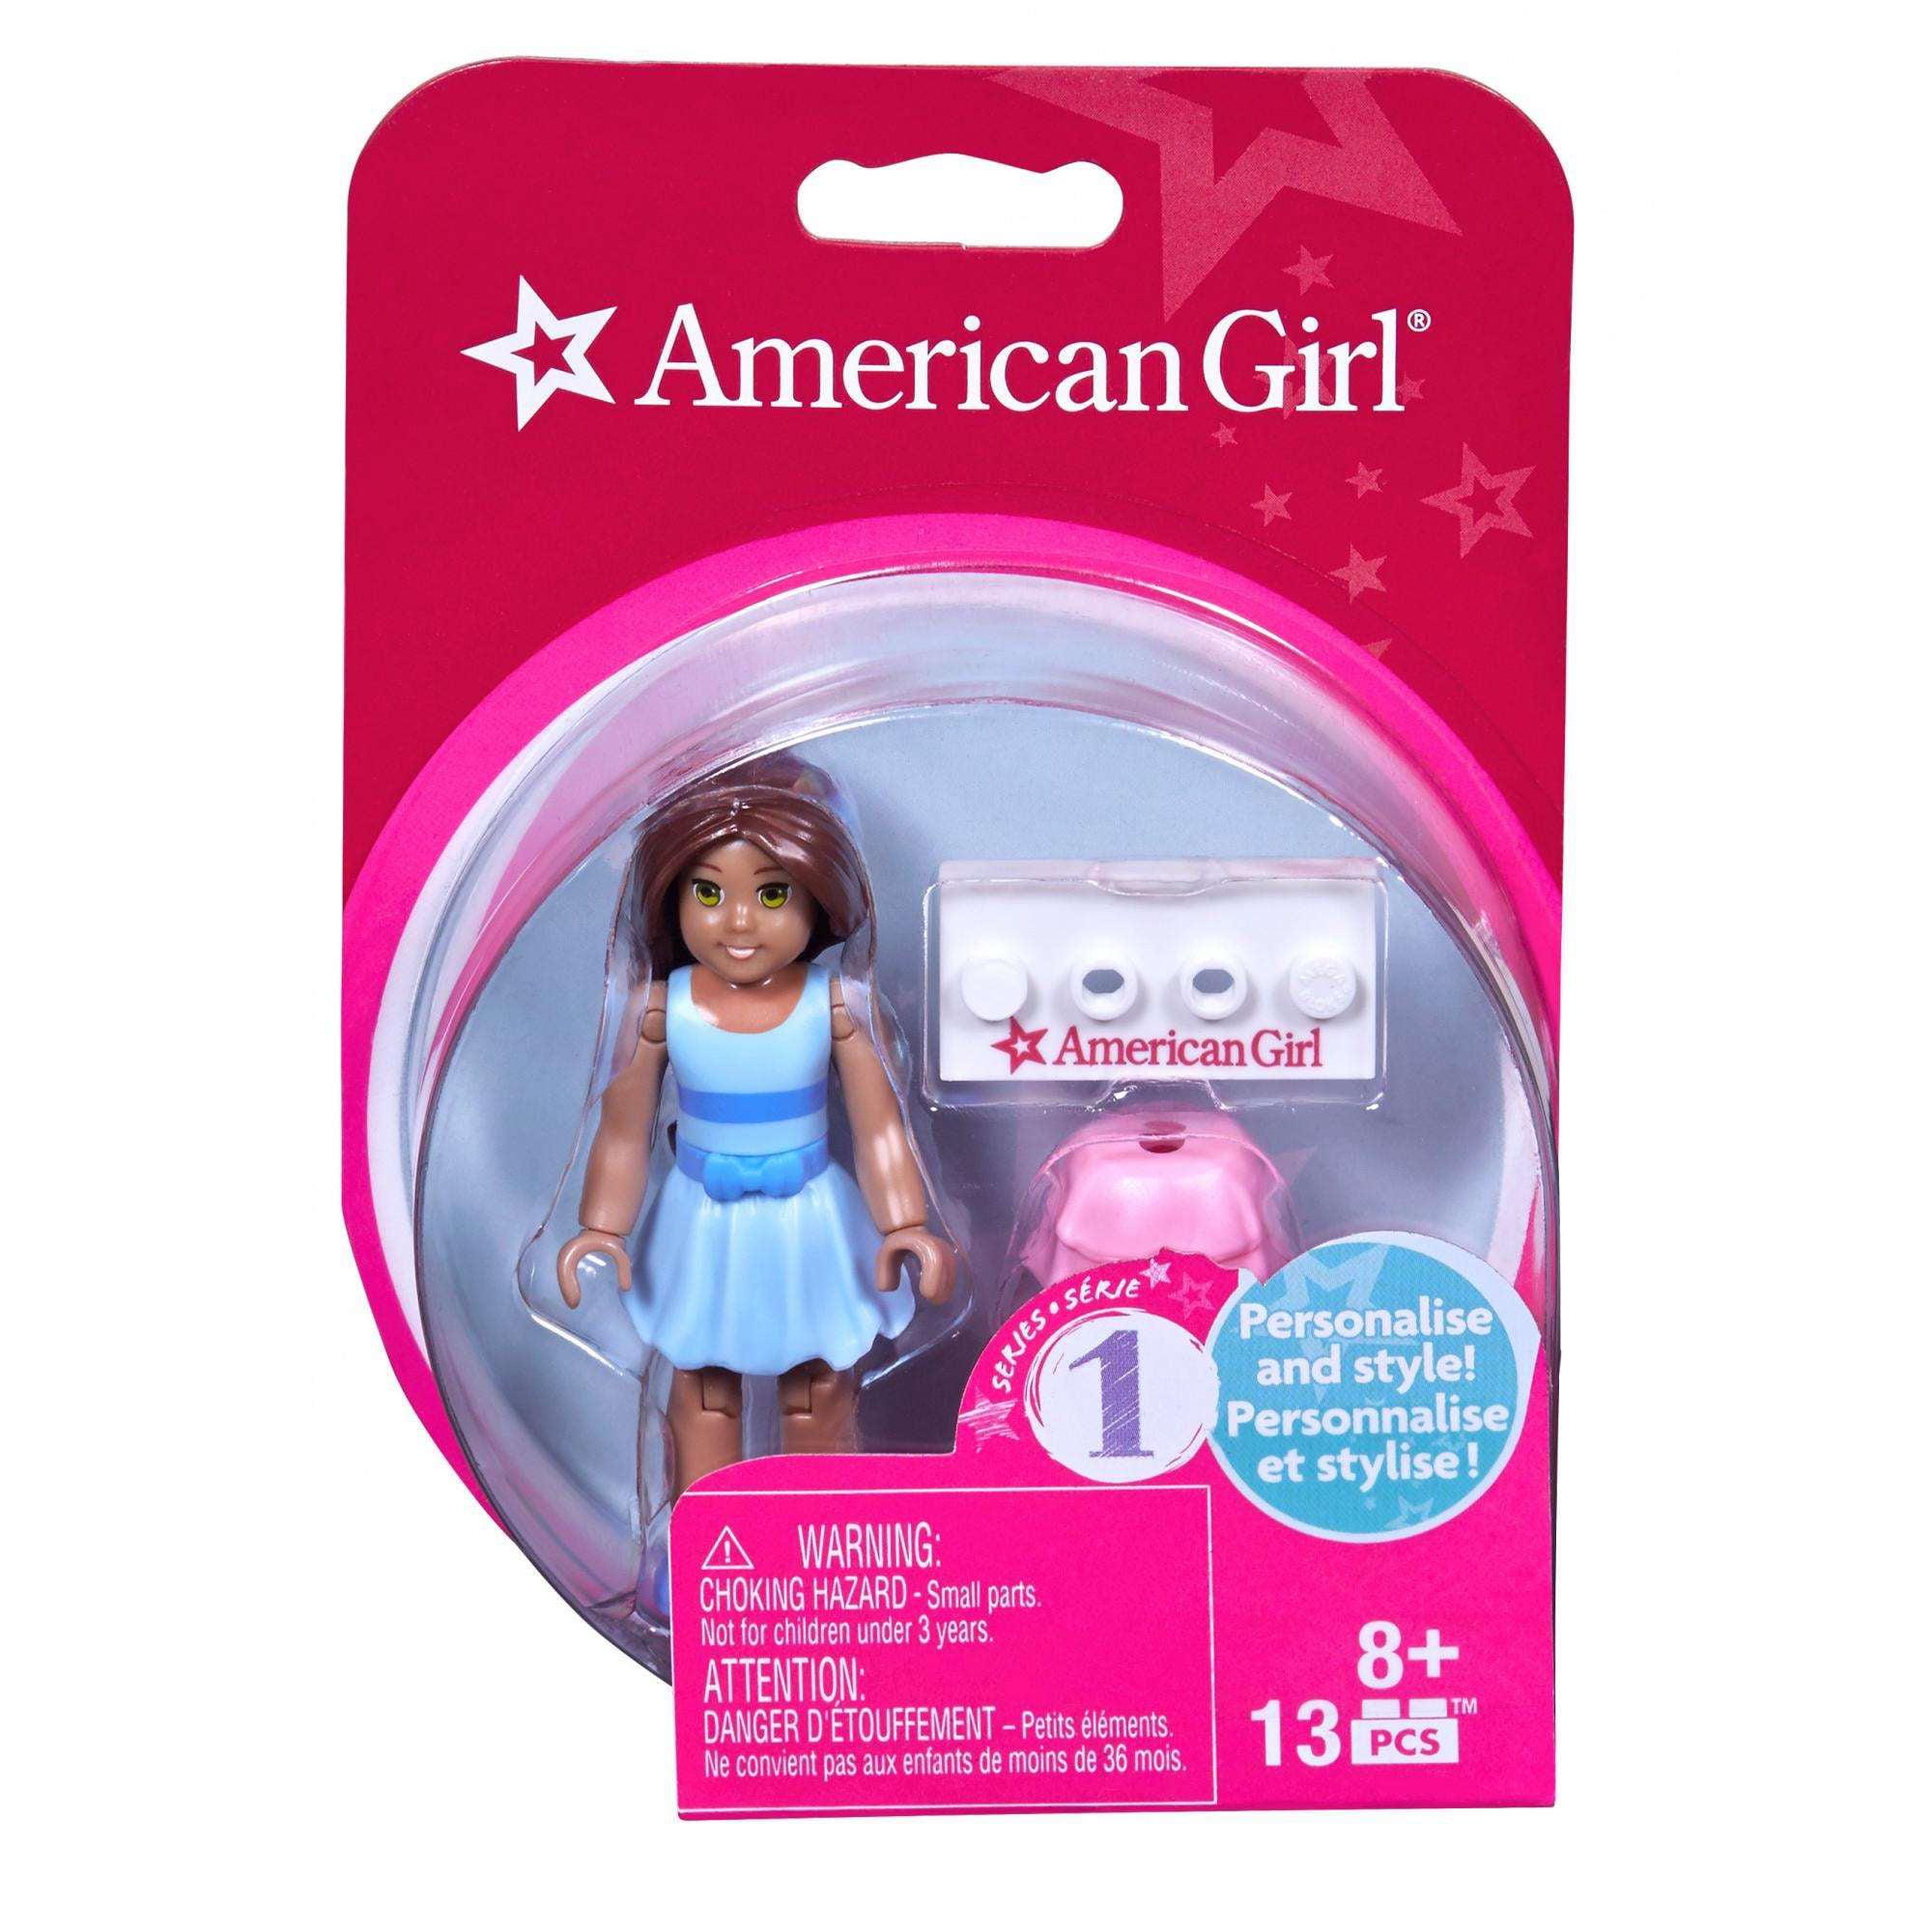 Mega Bloks Series 1 American Girl #2 Collectible Figure